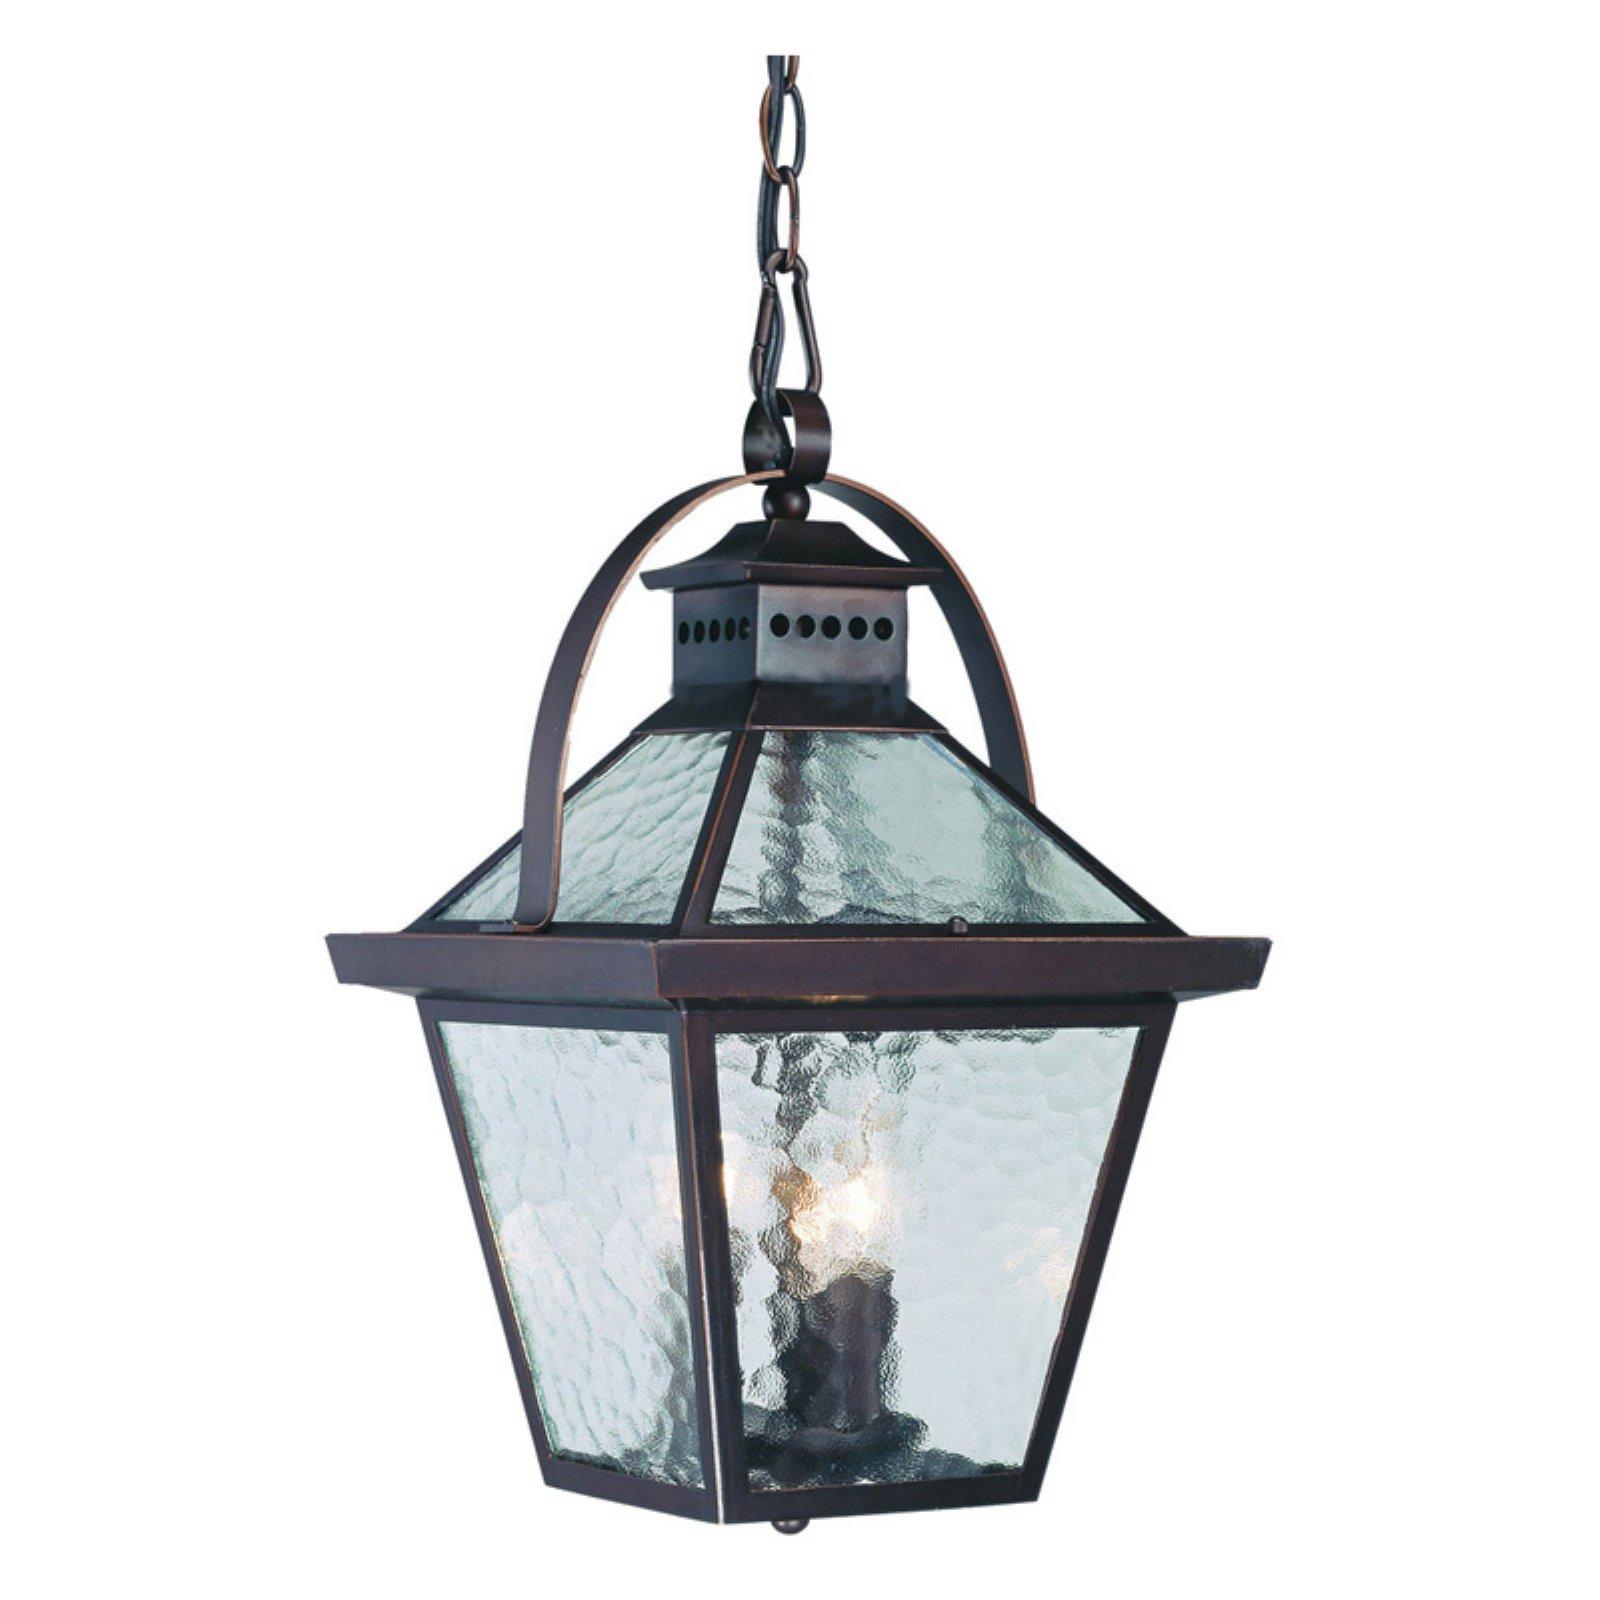 Acclaim Lighting Bay Street 9.75 in. Outdoor Hanging Lantern Light Fixture